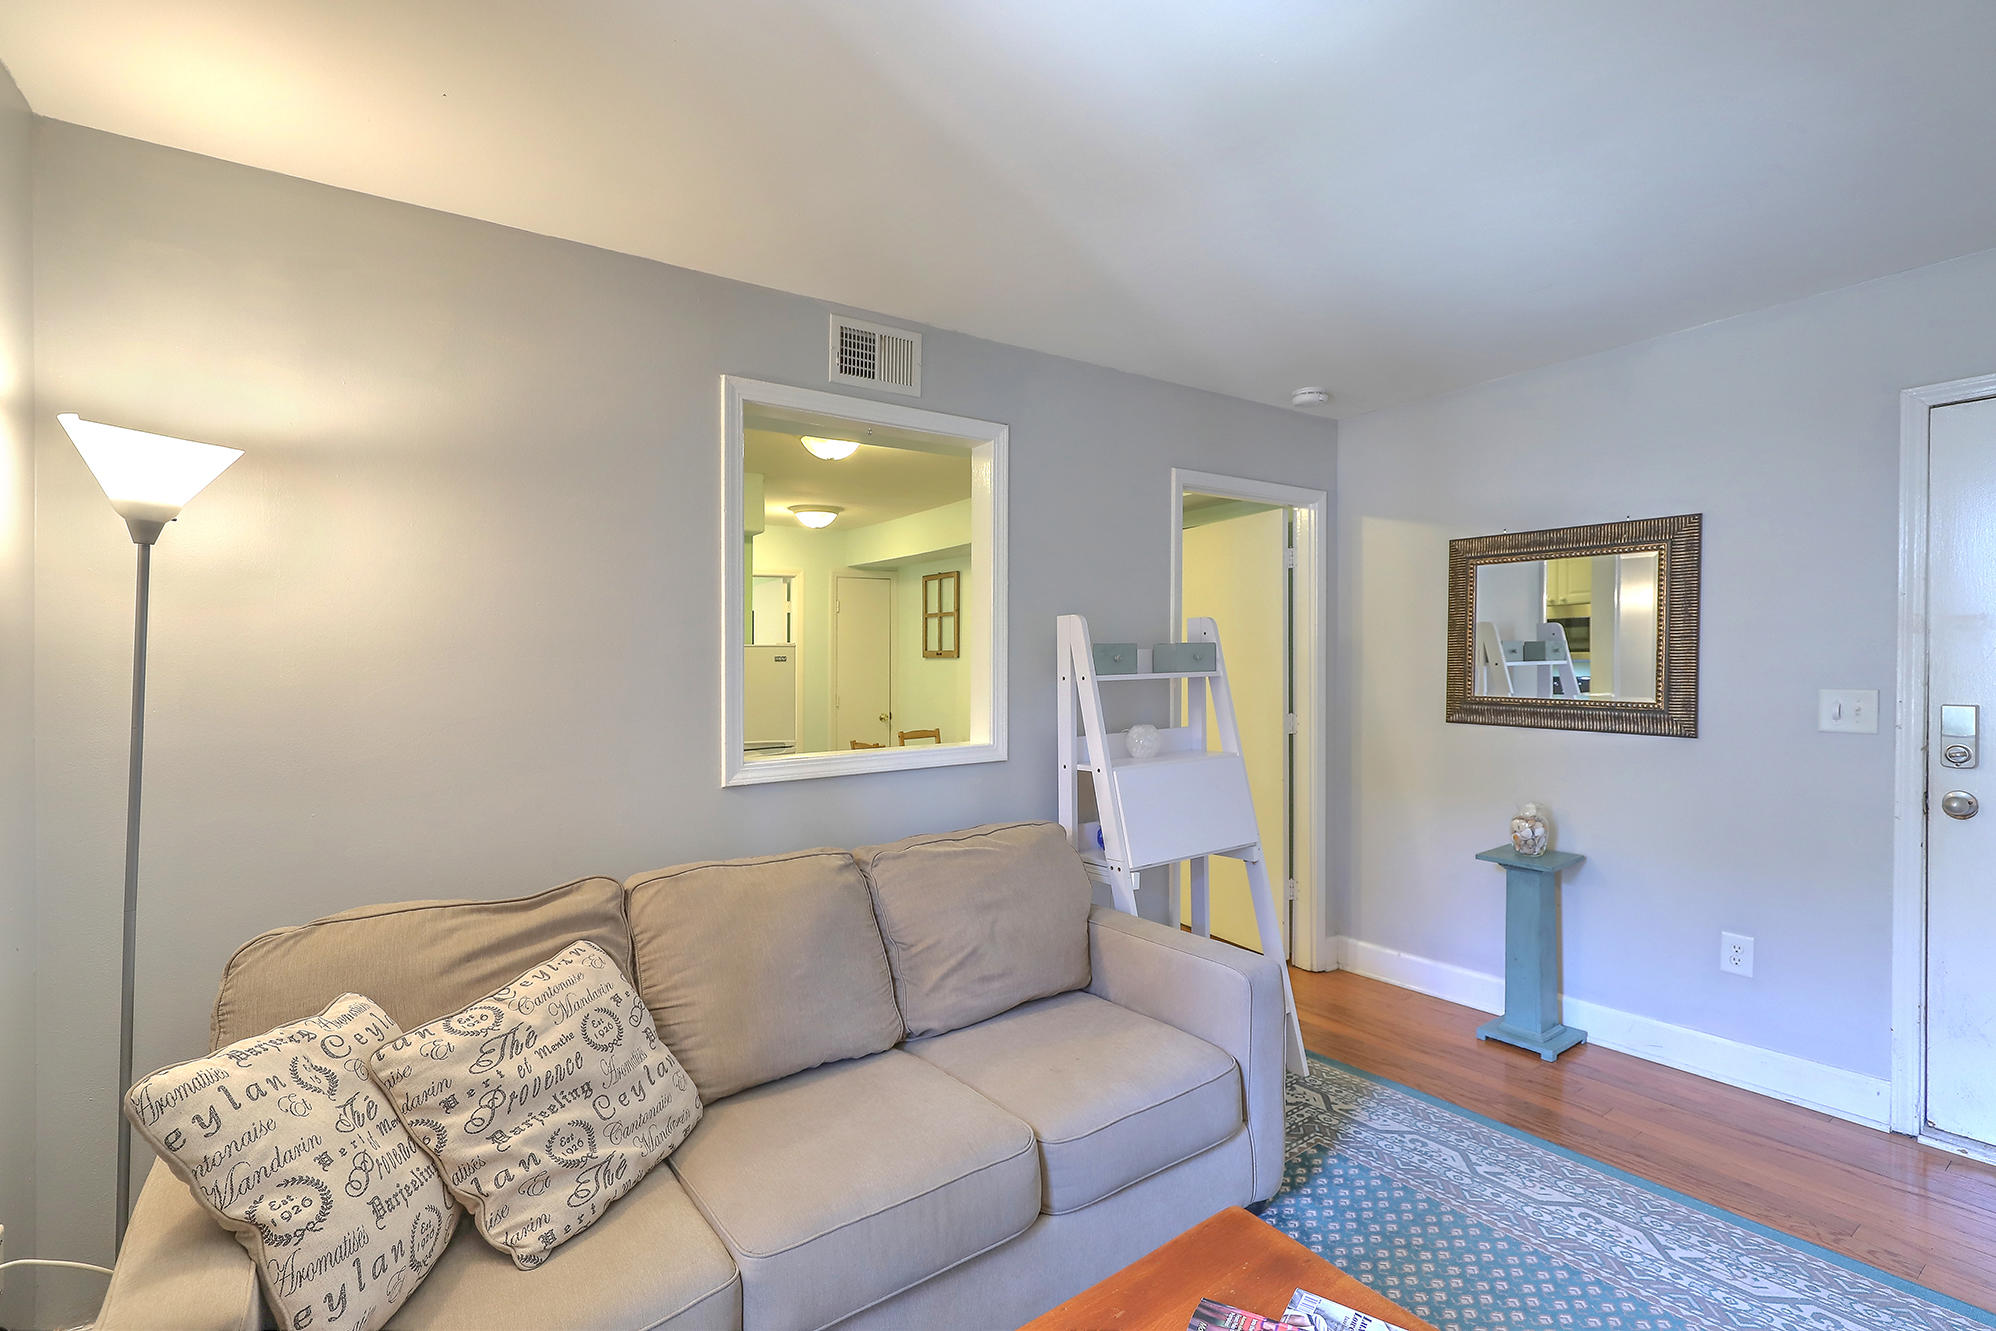 Marsh Grass Condominiums Homes For Sale - 1501 Ben Sawyer, Mount Pleasant, SC - 16